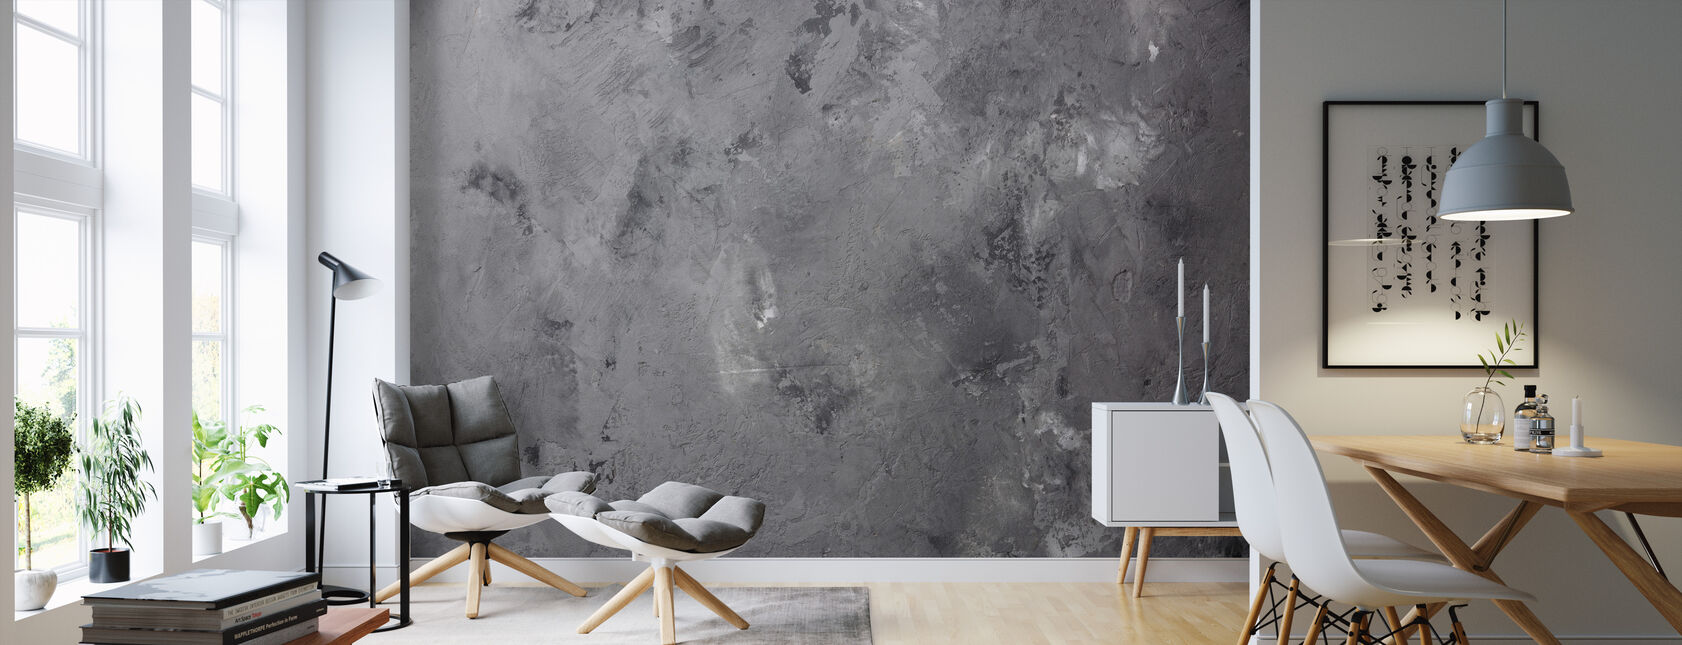 Aged Concrete - Wallpaper - Living Room